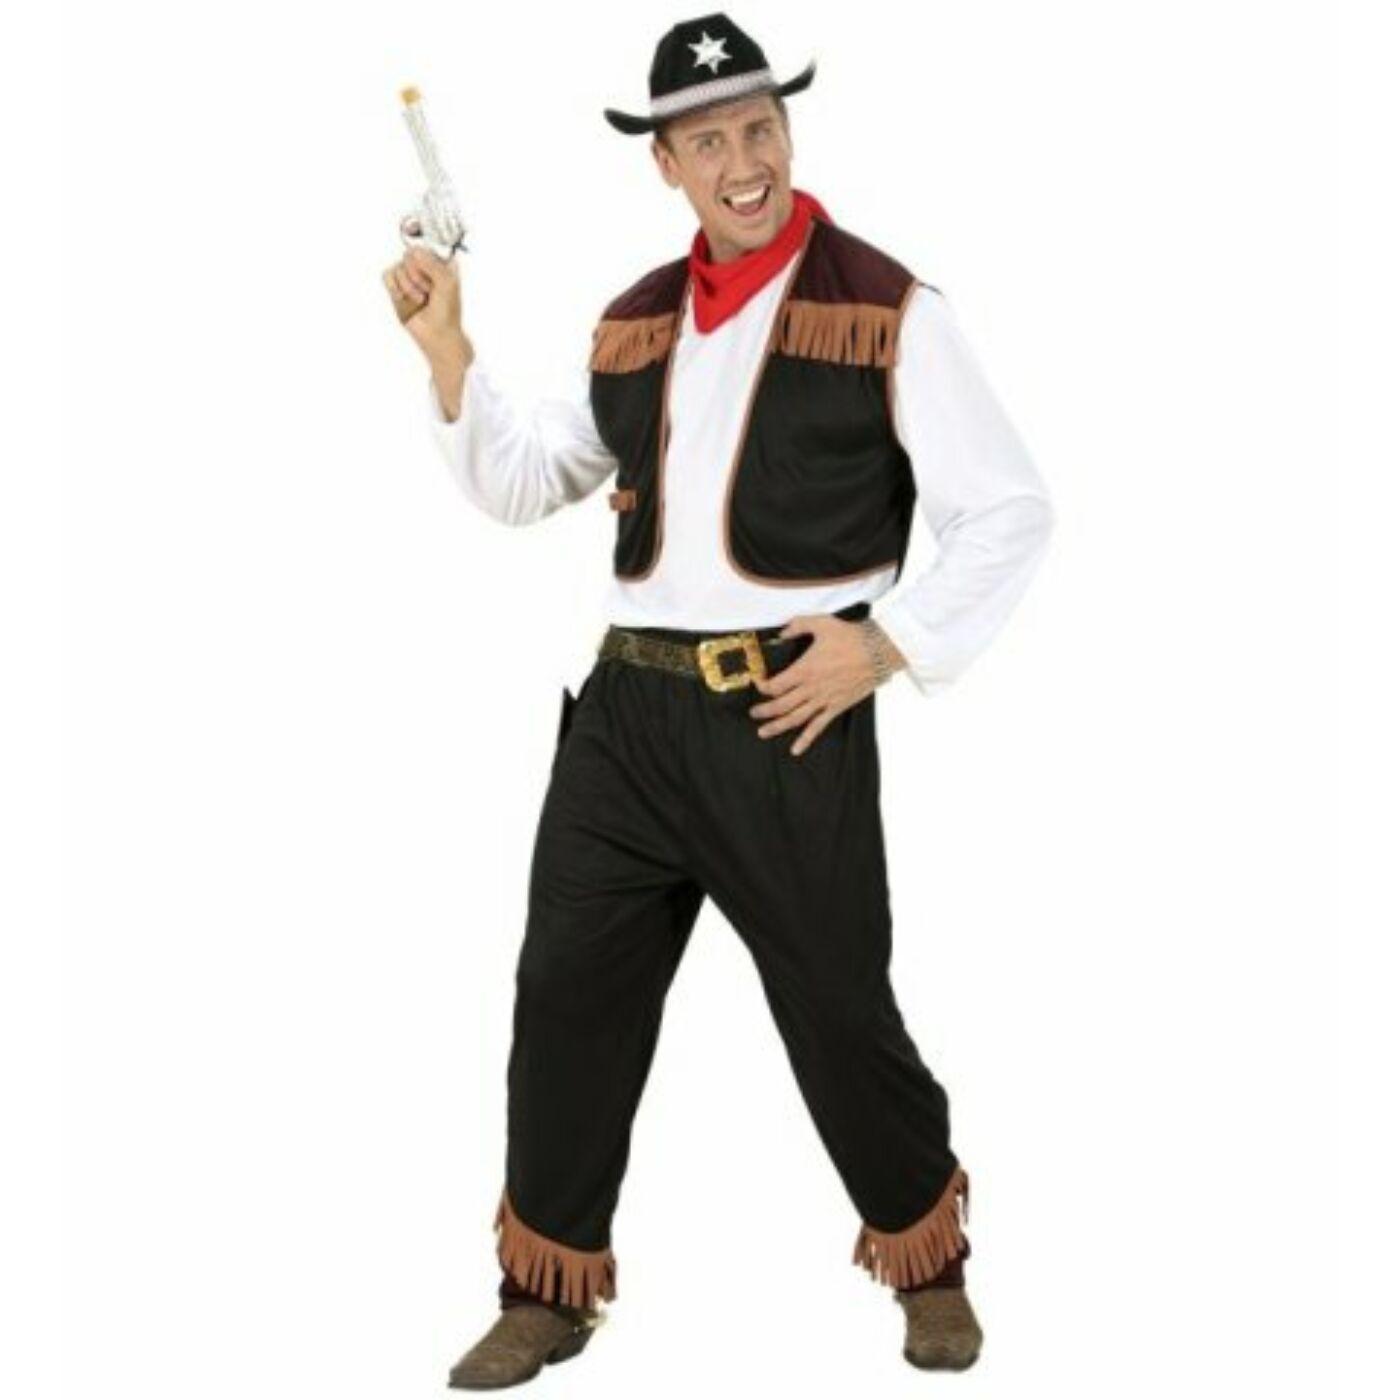 Cowboy jelmez M-es